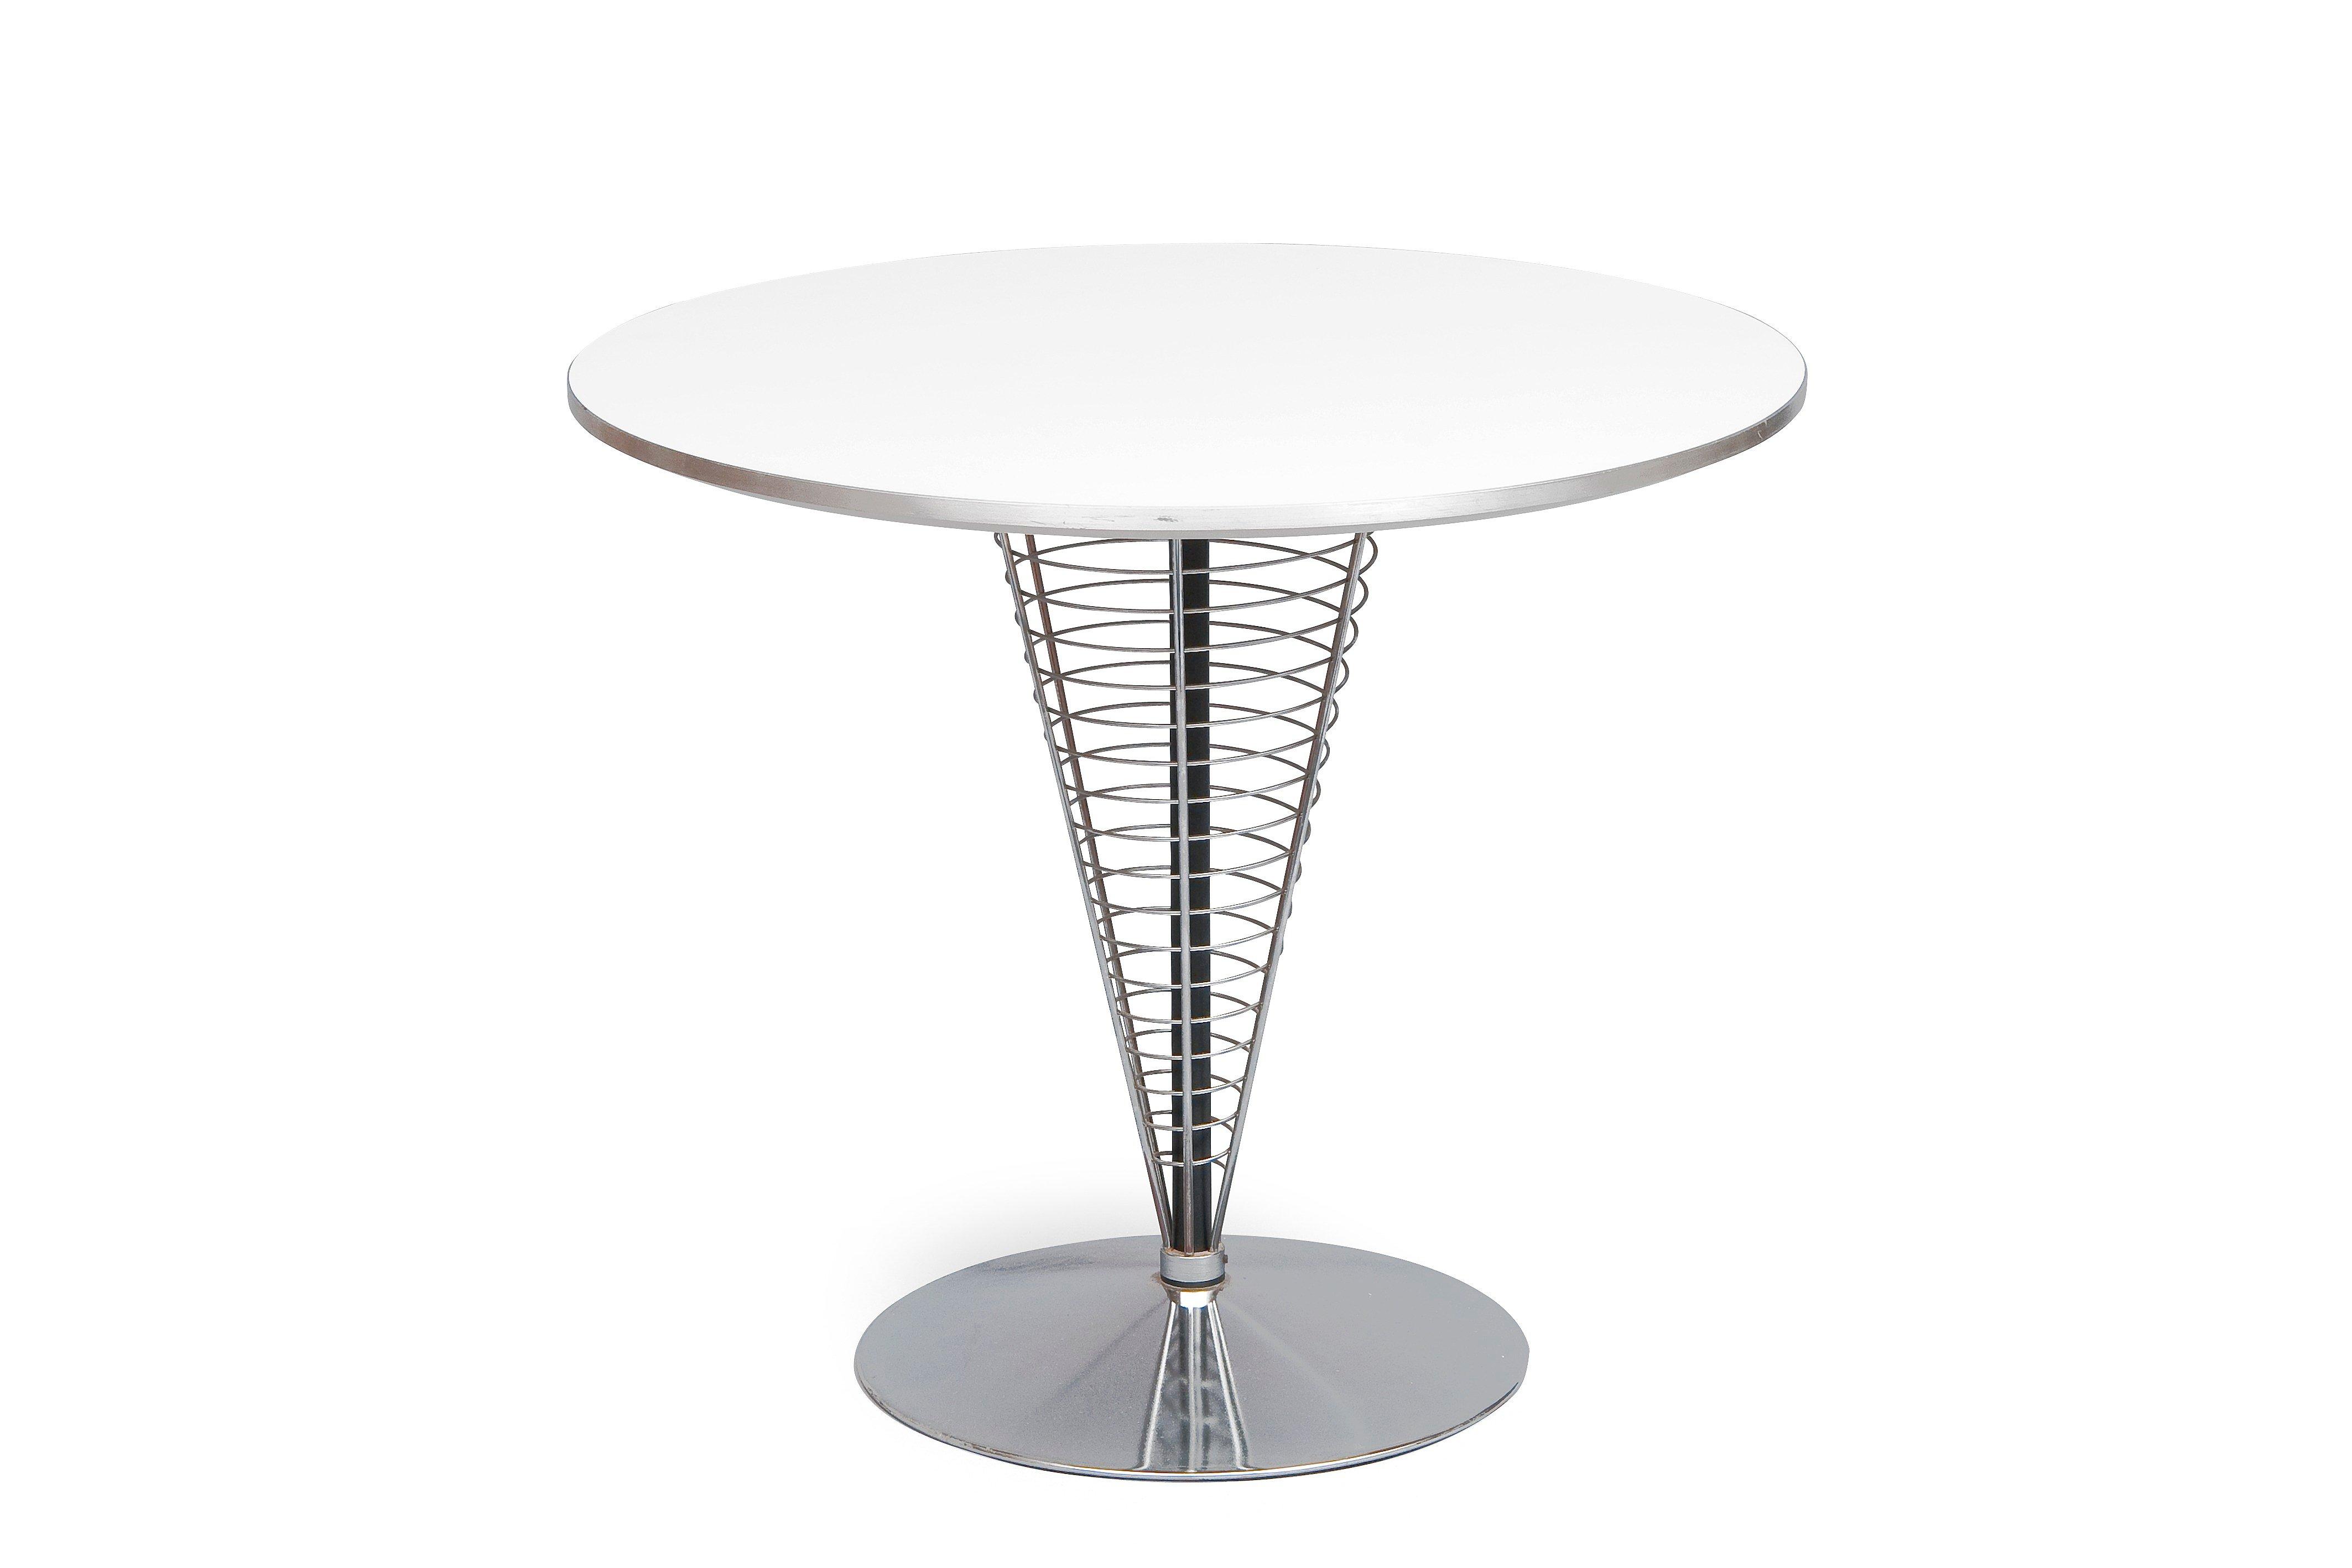 verner panton wire cone table bukowskis. Black Bedroom Furniture Sets. Home Design Ideas